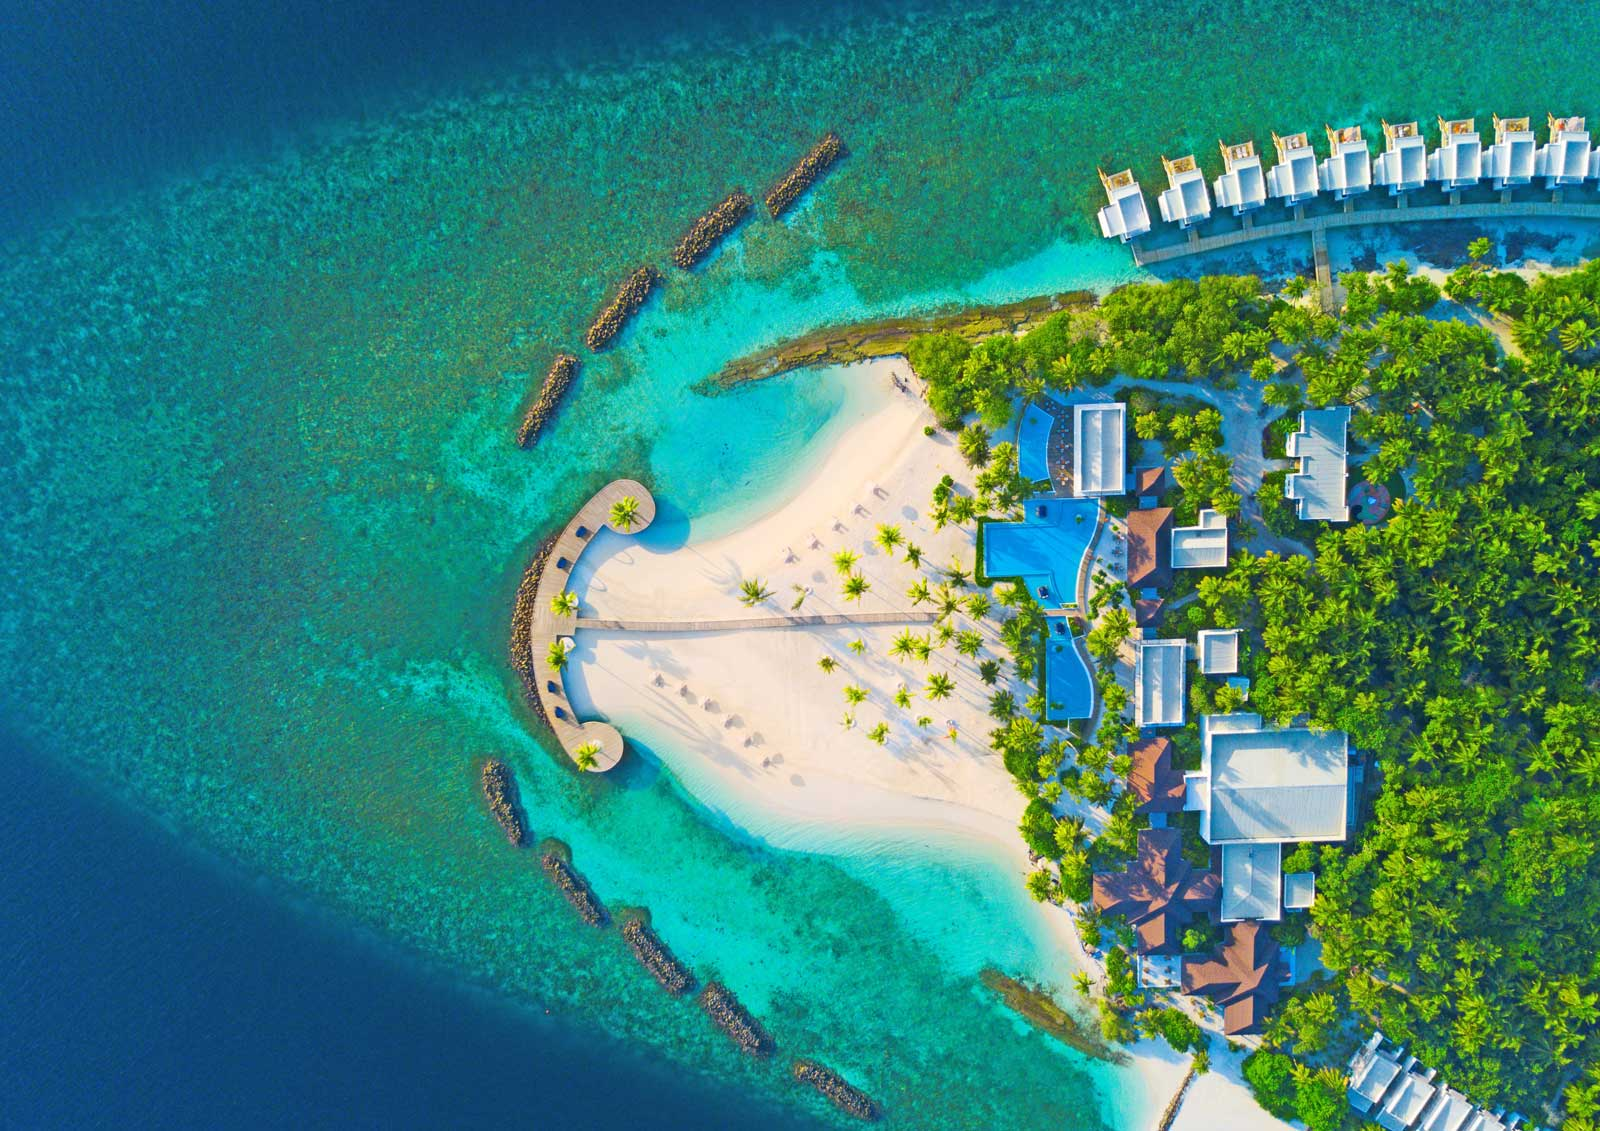 dhigali-maldives-aerial-view